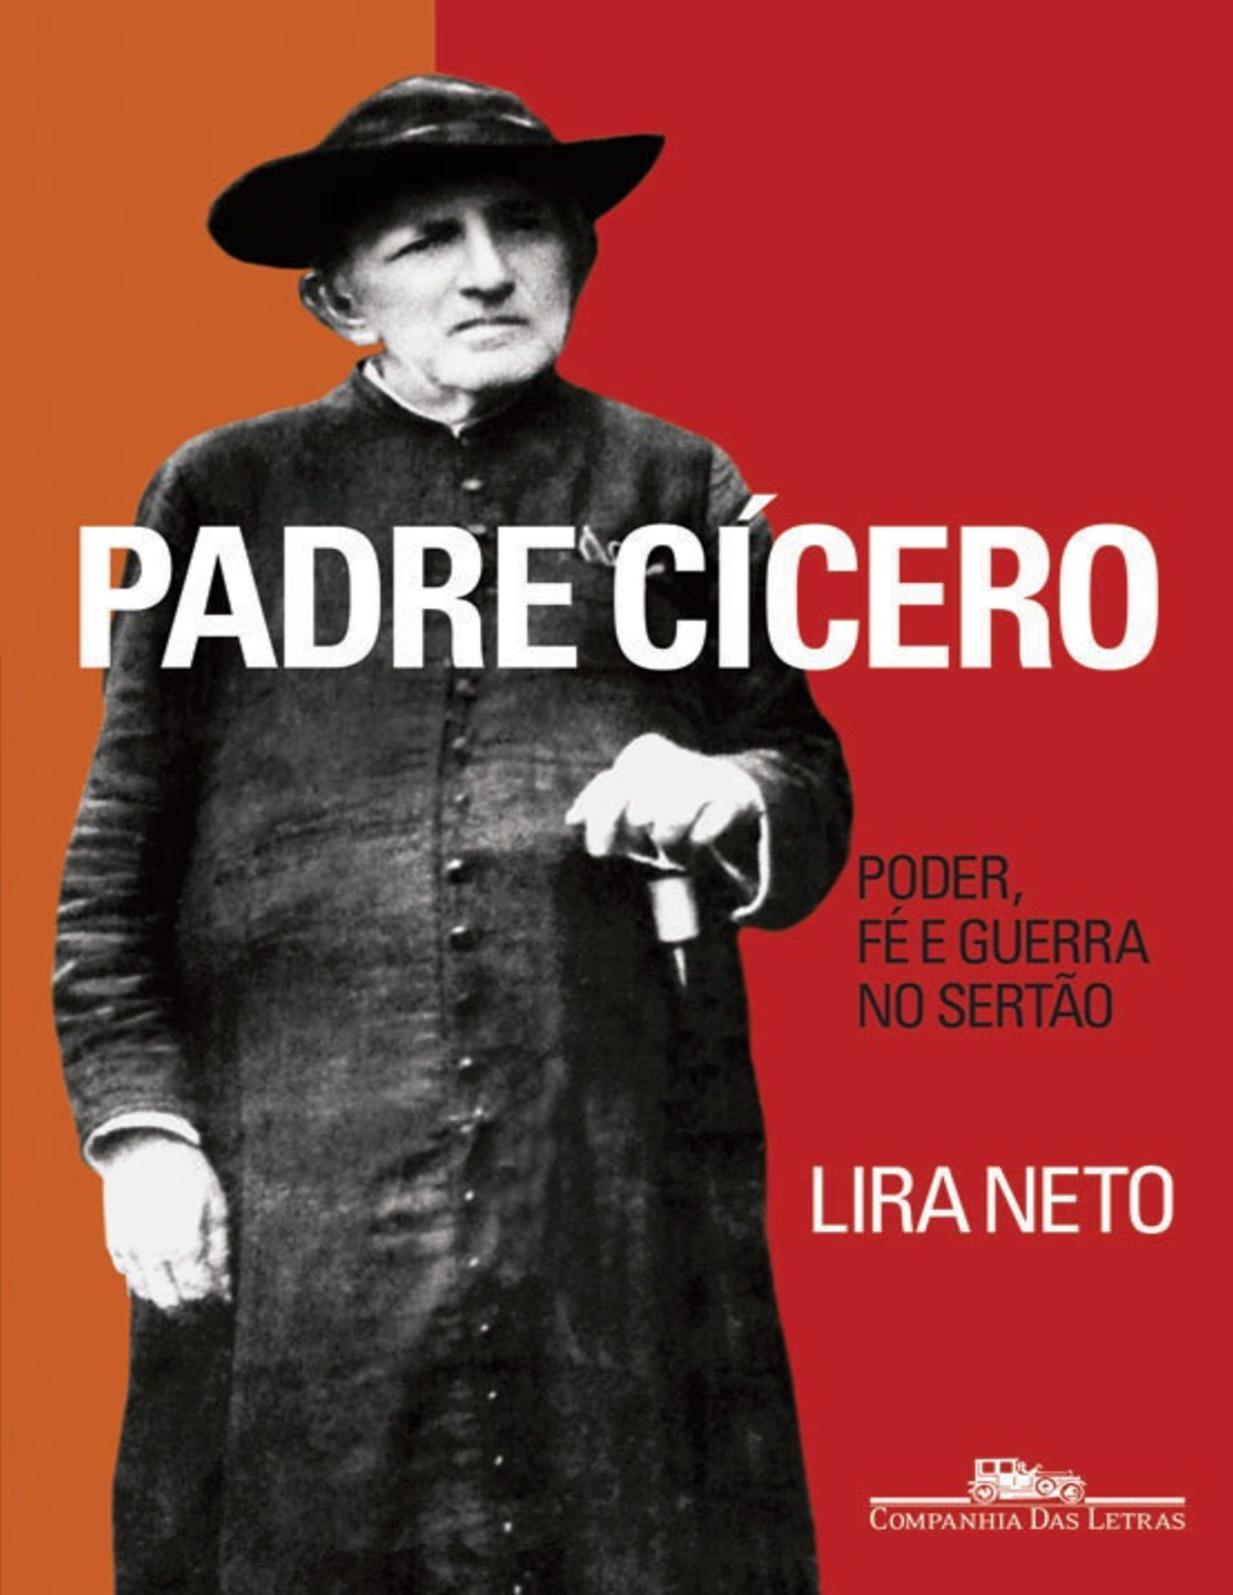 77aa29bf1 Calaméo - Padre Cicero Poder Fe E Guer Lira Neto